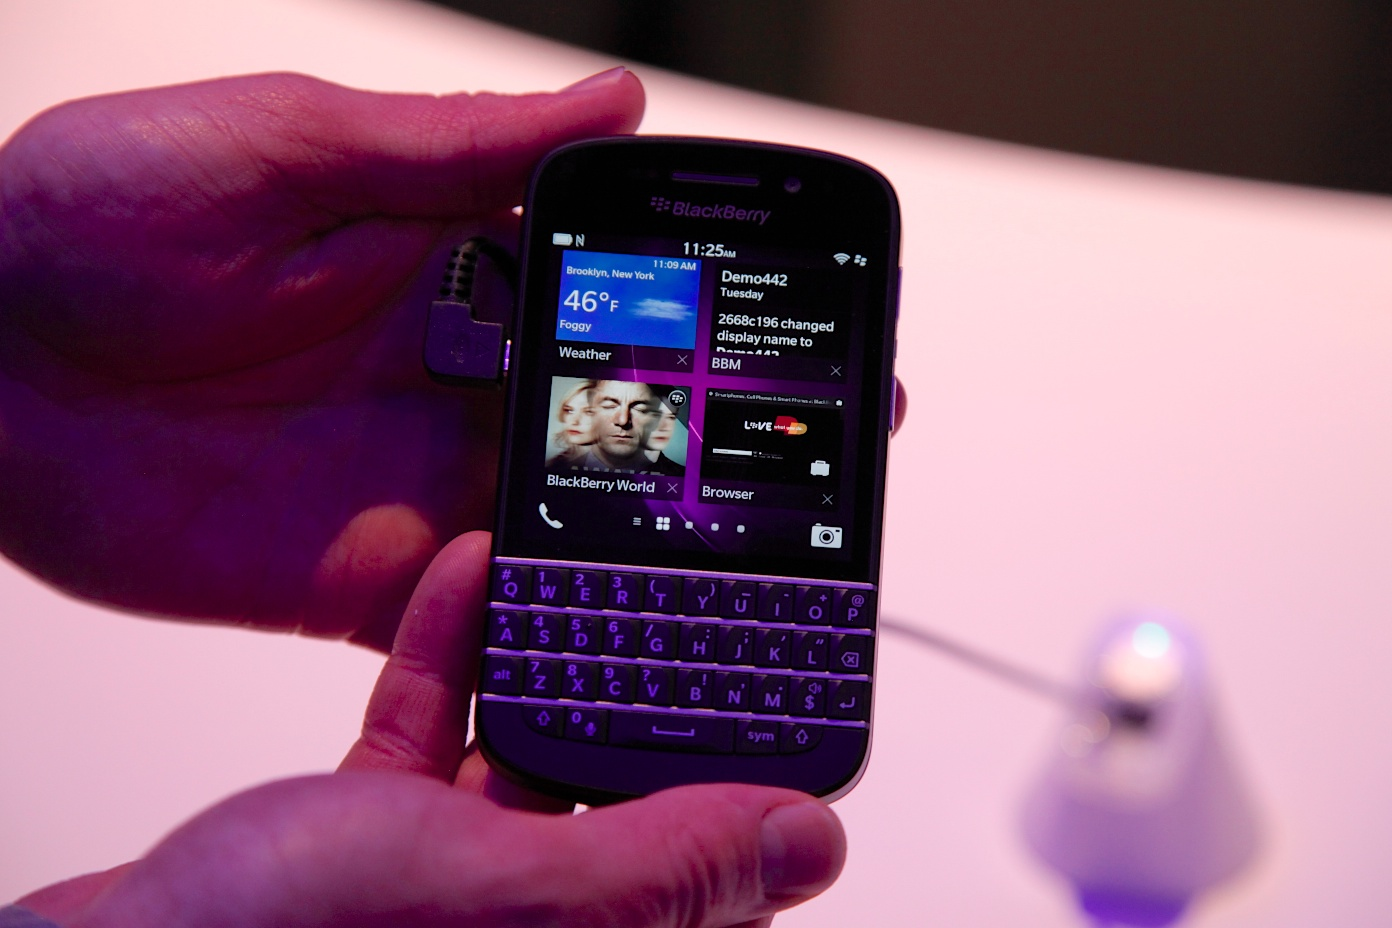 BlackBerry Q10 Release Date